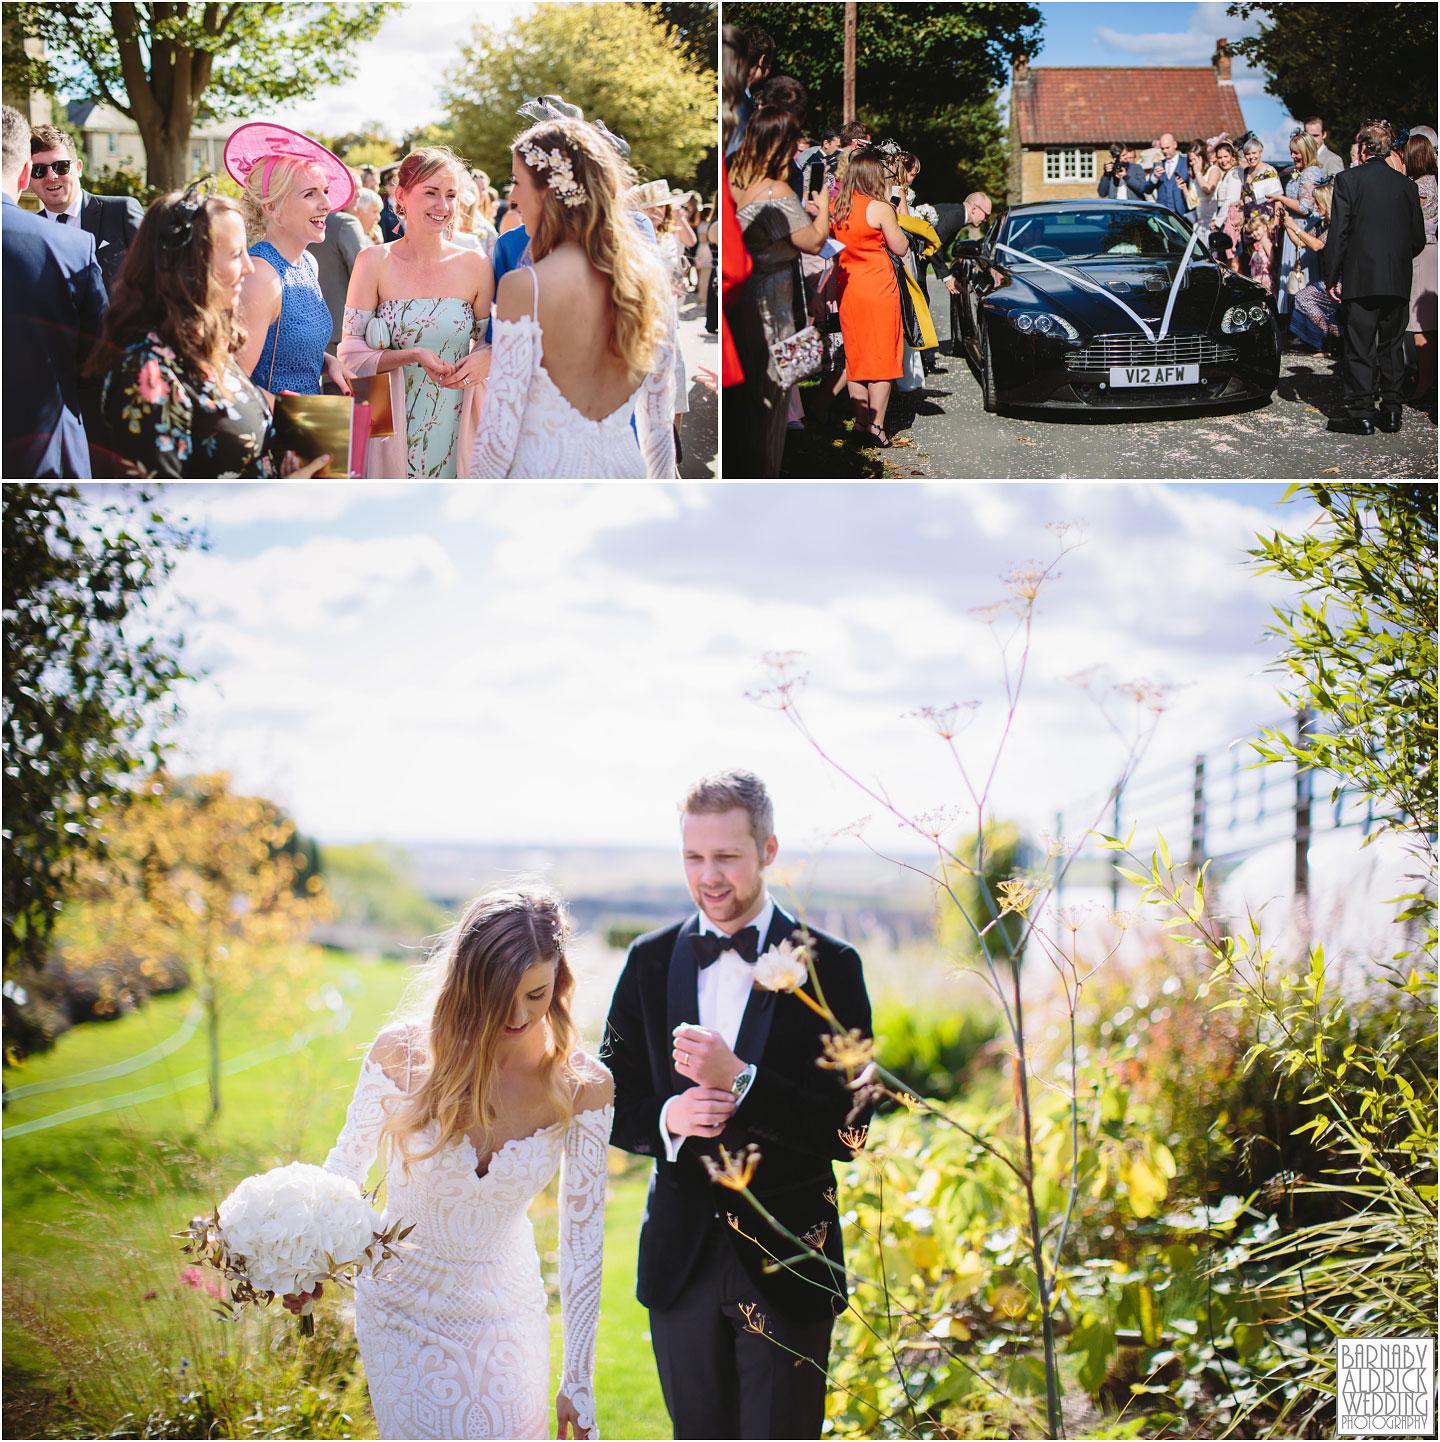 Wedding couple photos at Hornington Manor, Wedding band at Hornington Manor, Hornington Manor Wedding Photography, Hornington Manor Wedding Photographer, Yorkshire Wedding, Yorkshire Wedding Photographer, York Luxury Barn Wedding Venue, Yorkshire farmhouse Wedding Barn